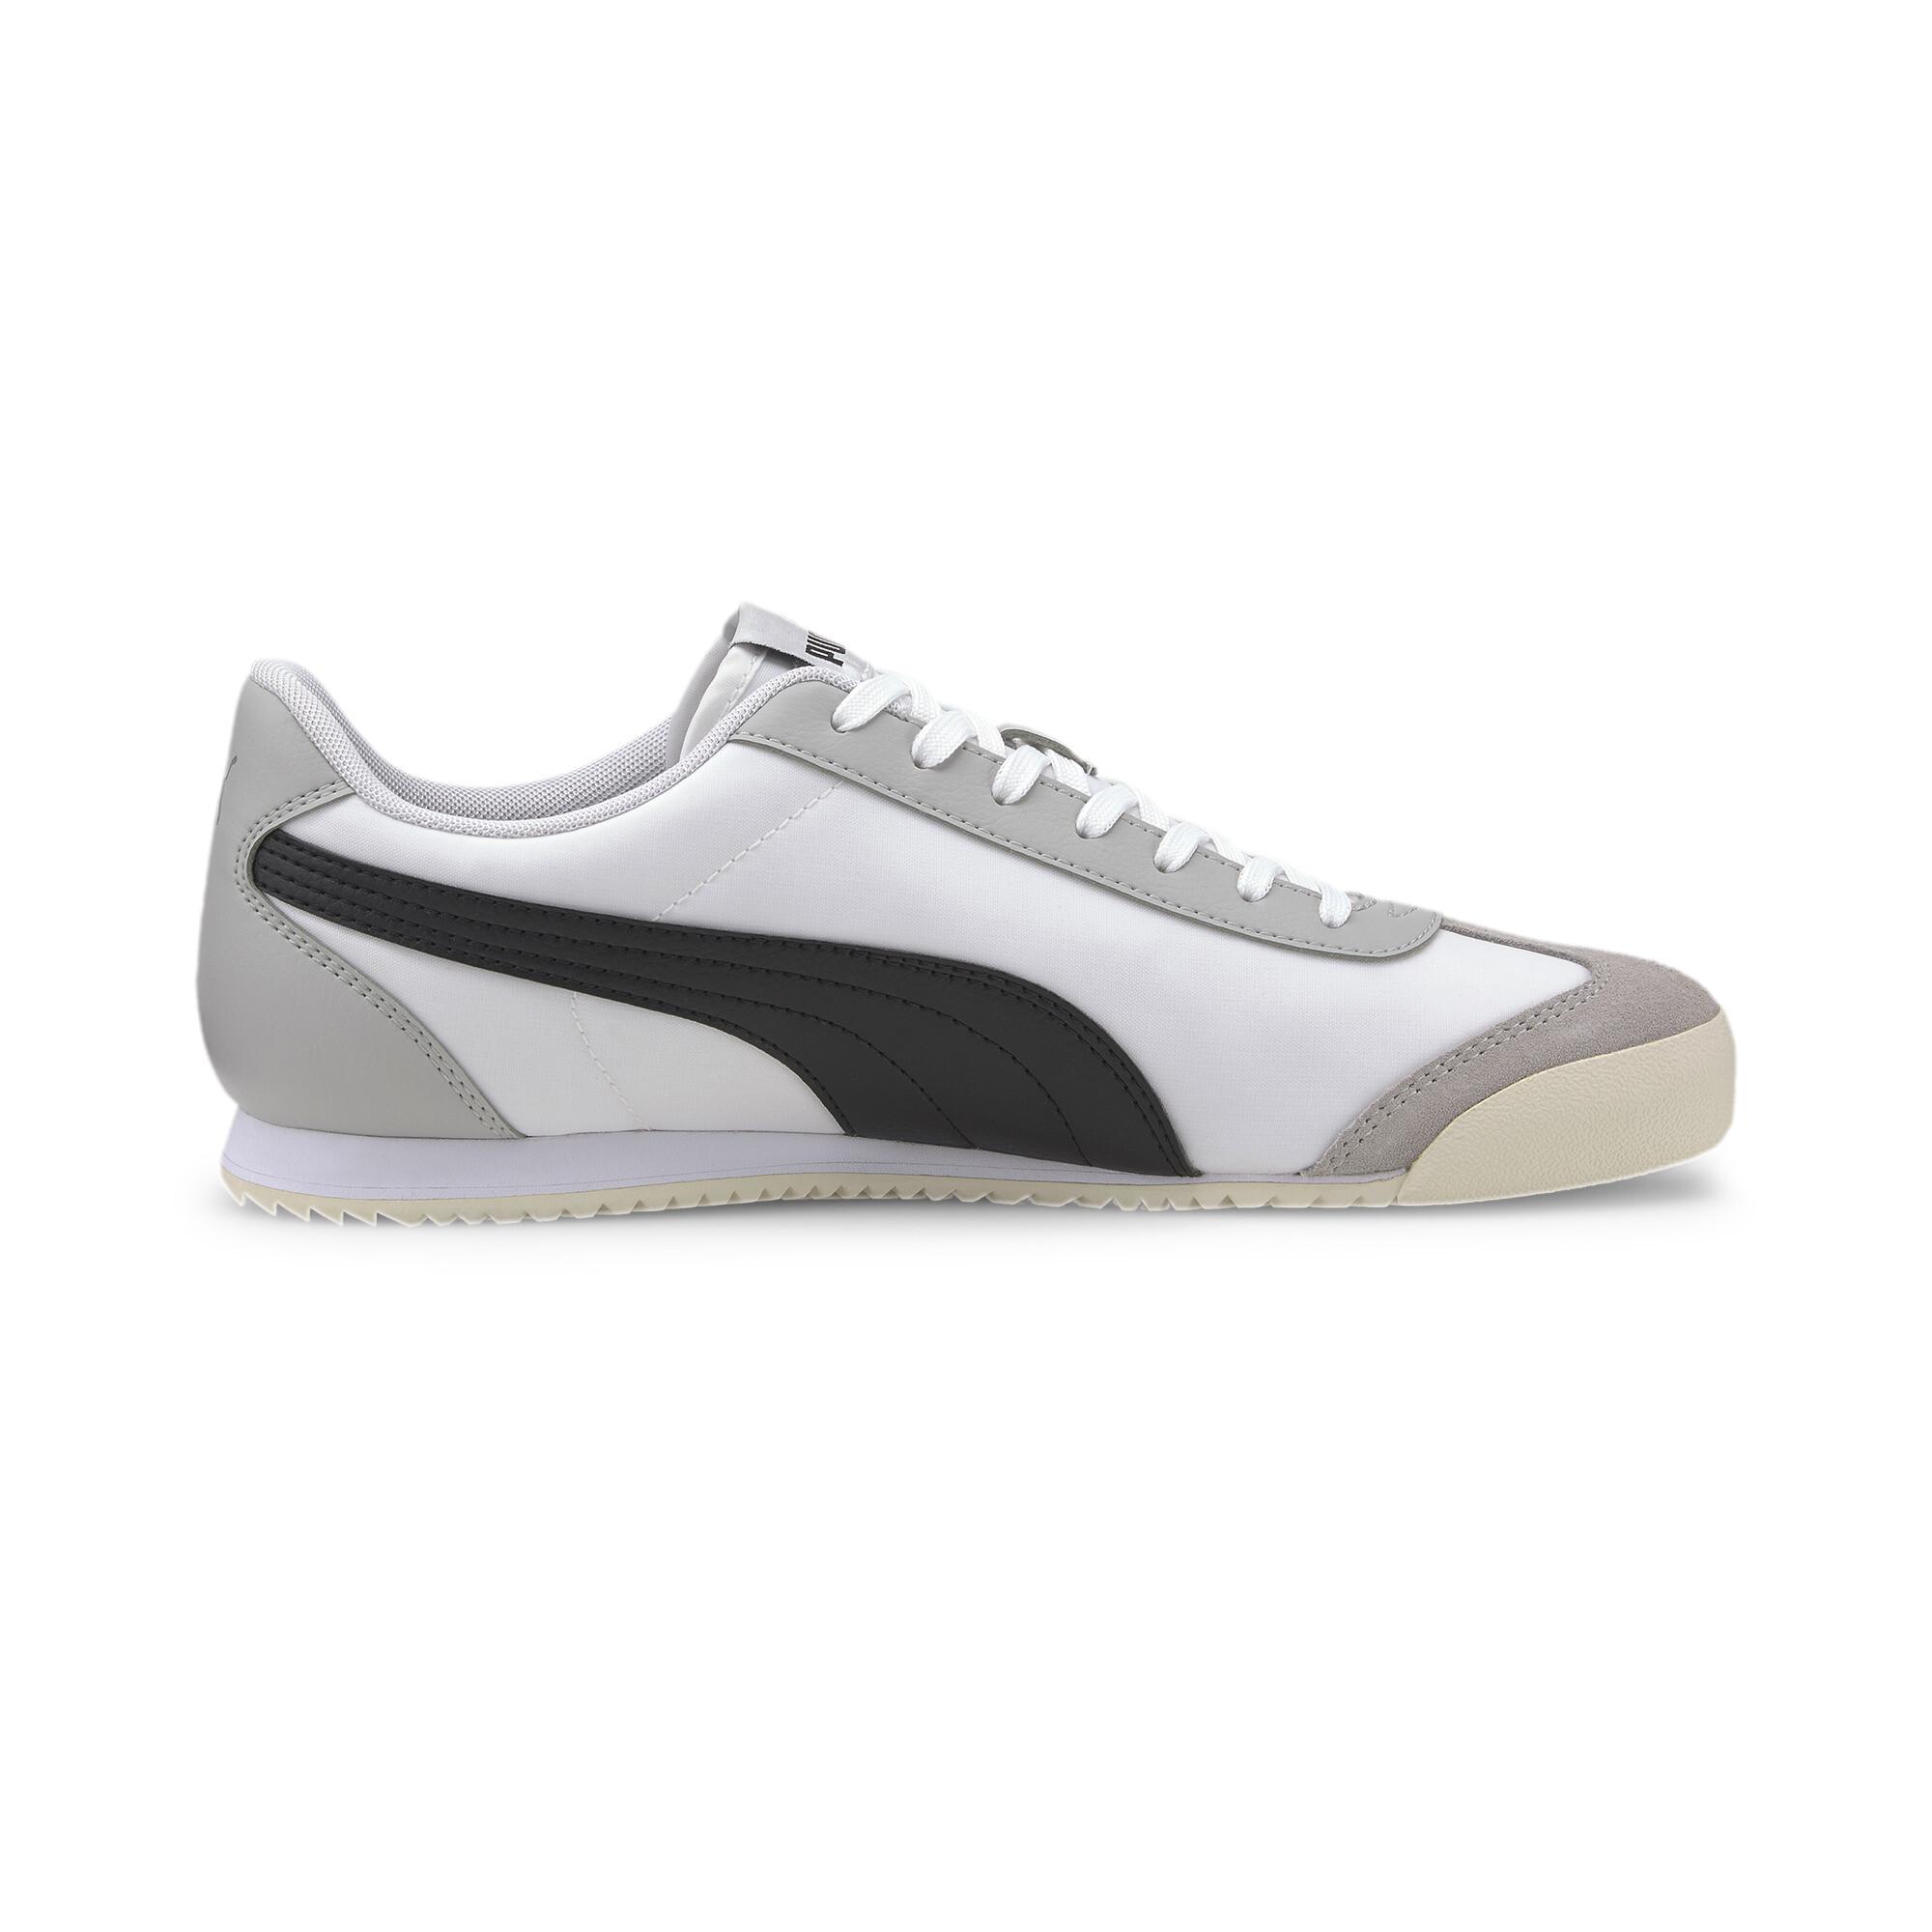 PUMA-Men-039-s-Turino-NL-Sneakers thumbnail 7